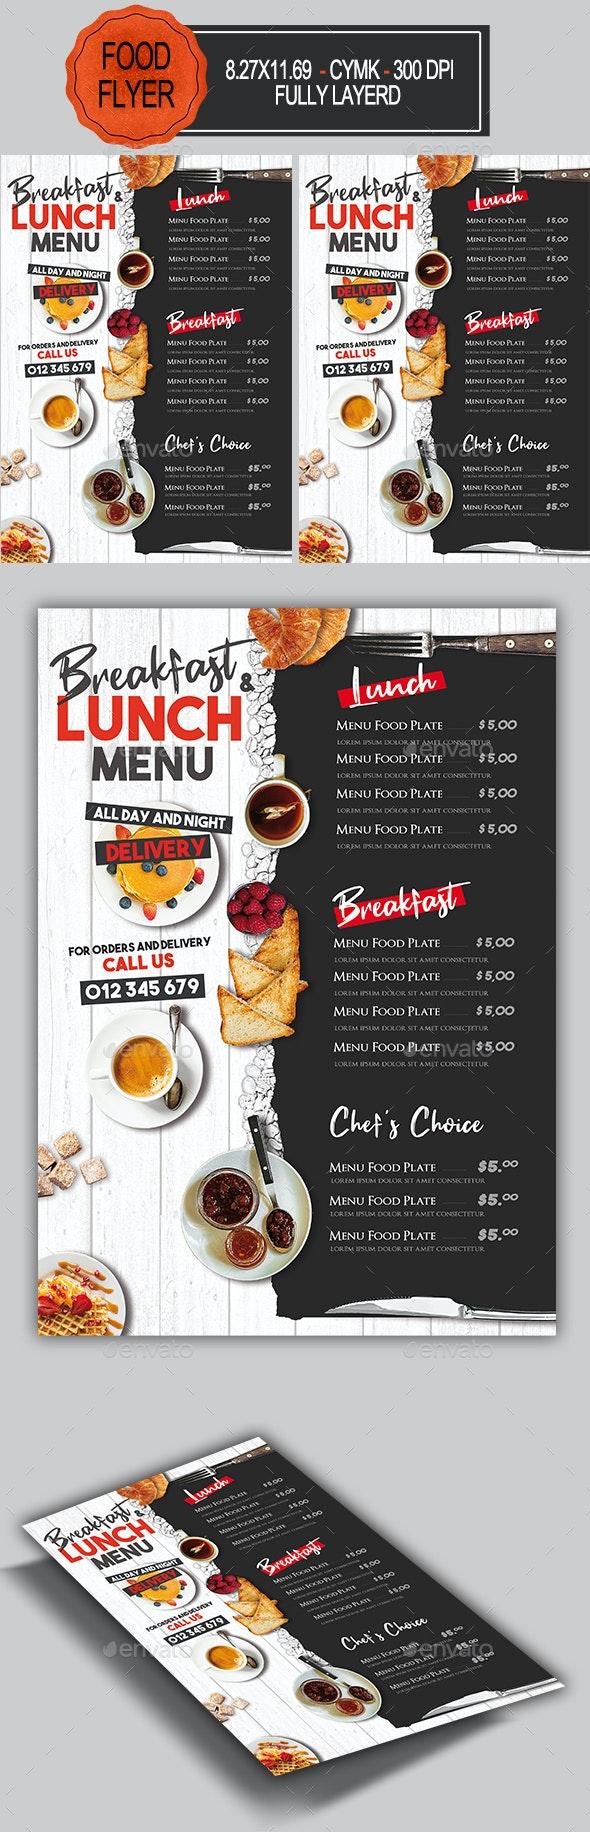 Breakfast Lunch Menu Delivery - Restaurant Flyers